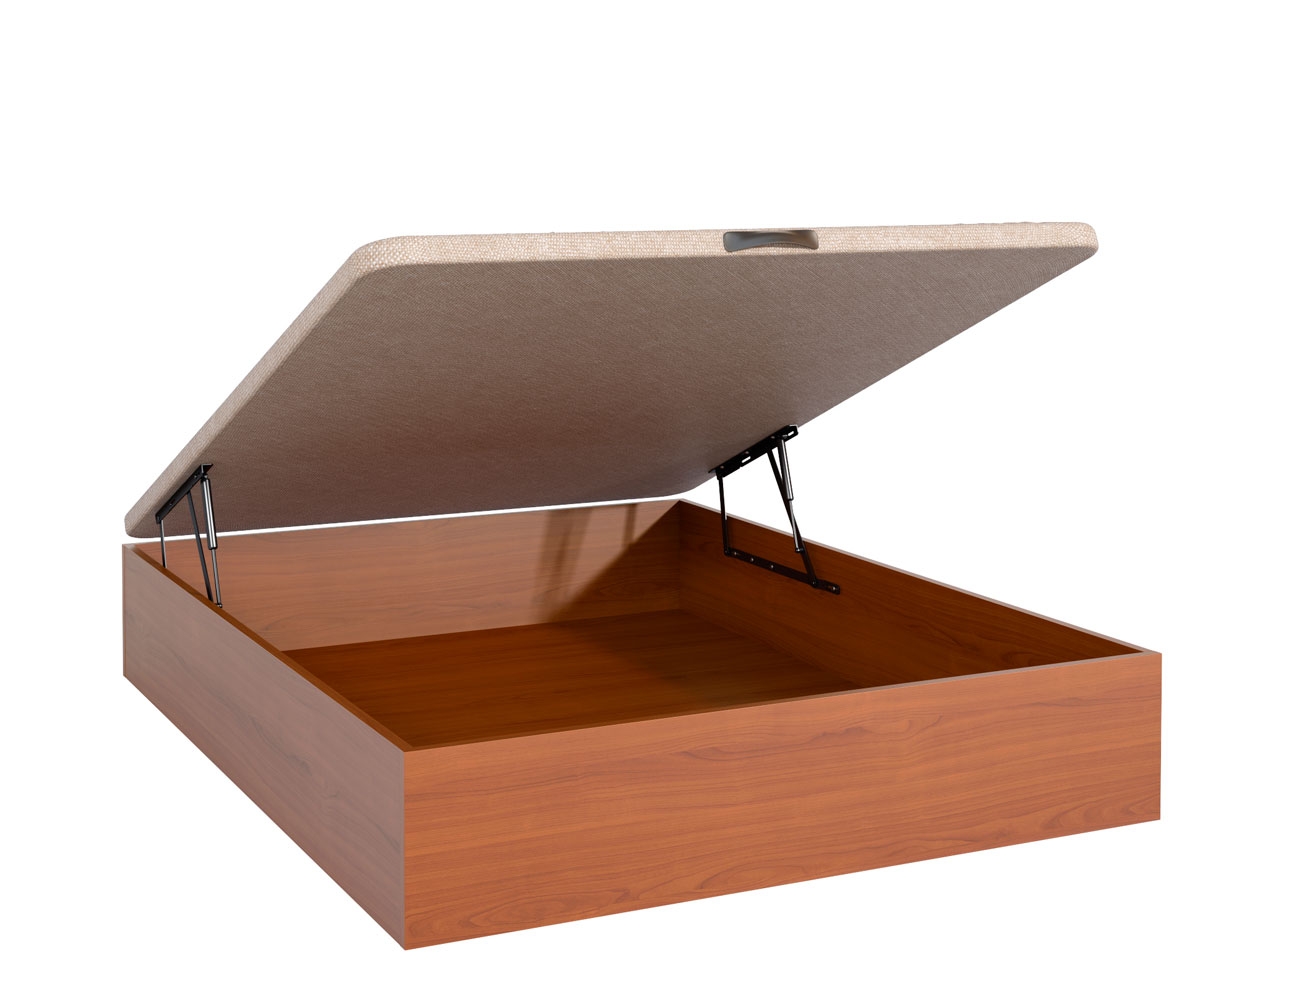 Canape madera nogal tapa 3d barato tajo abierto3